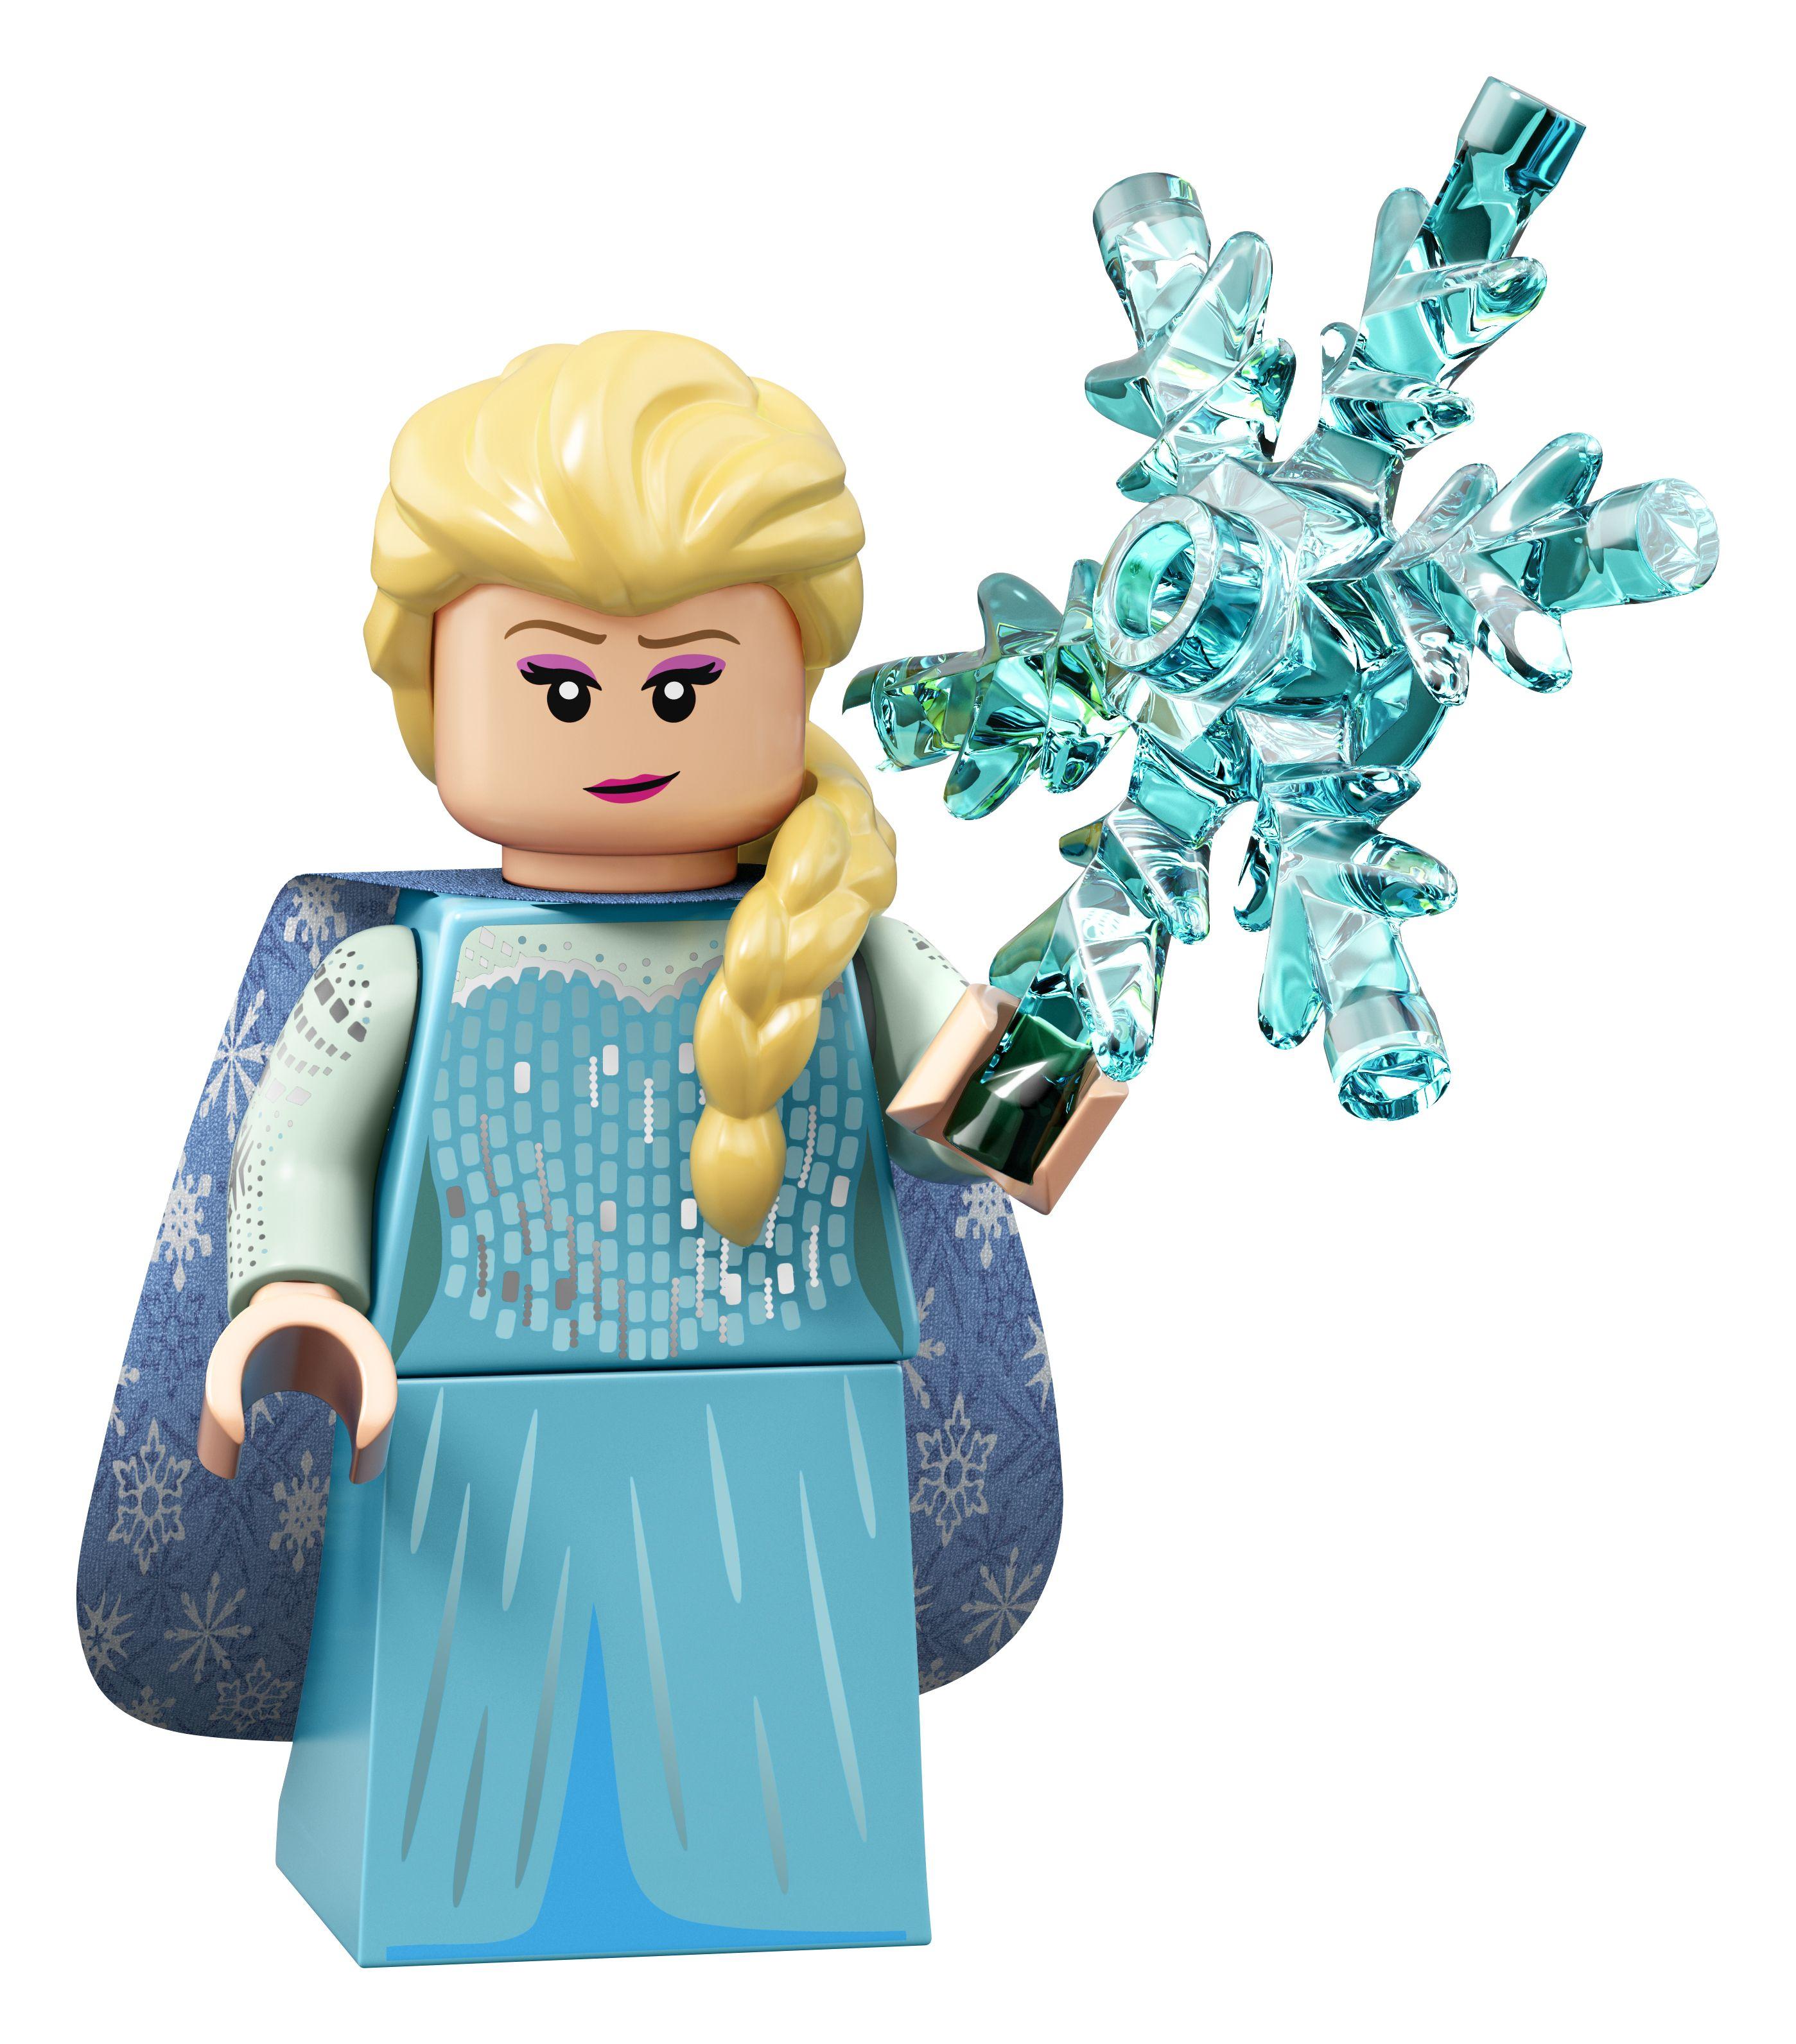 71024 IN HAND NOW LEGO MINIFIGURE SERIES 2 DISNEY ELSA